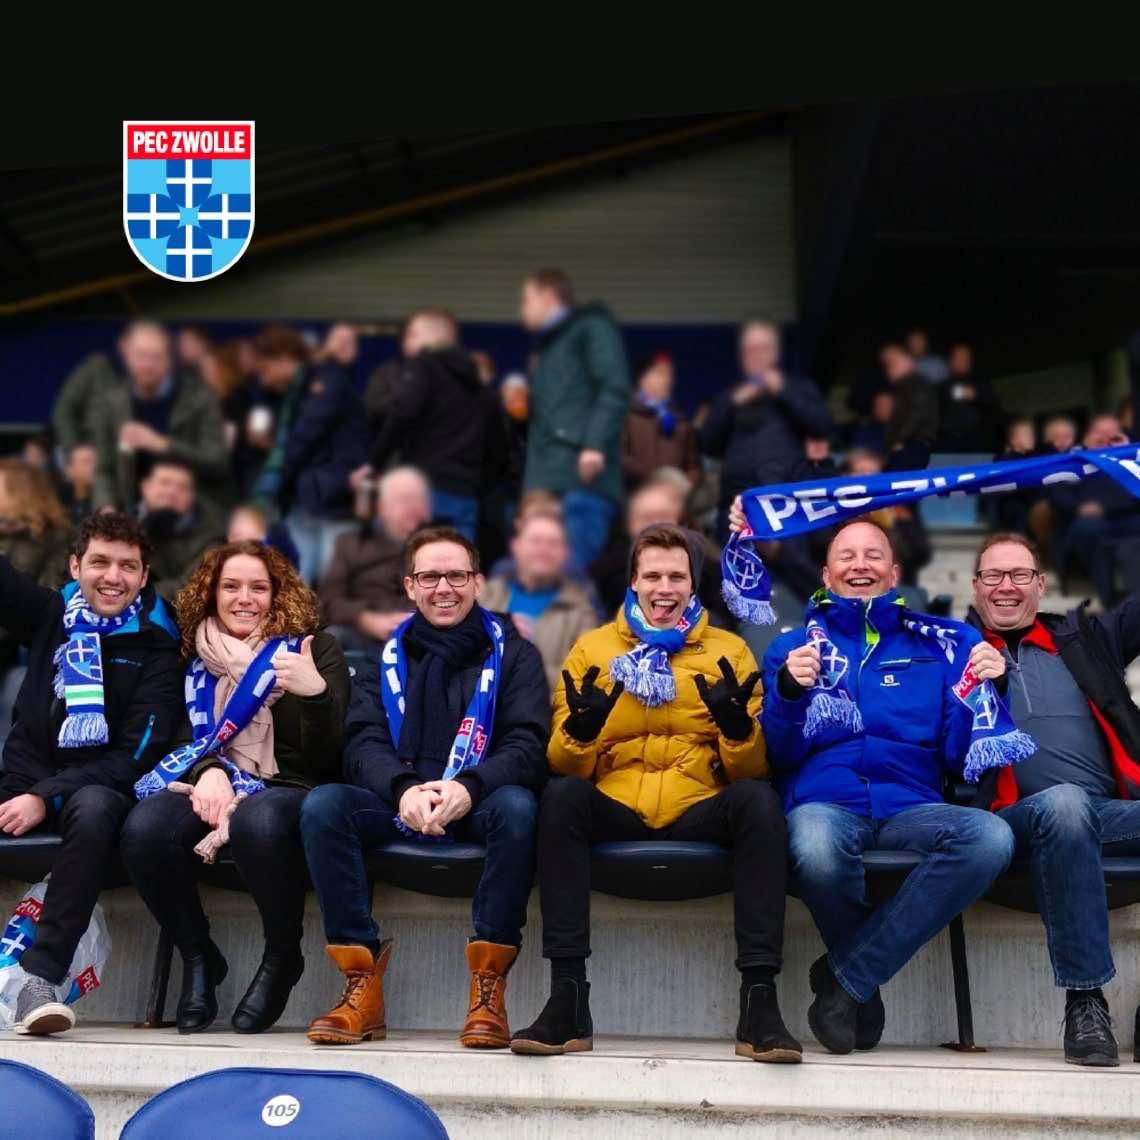 TeamValue & PEC Zwolle